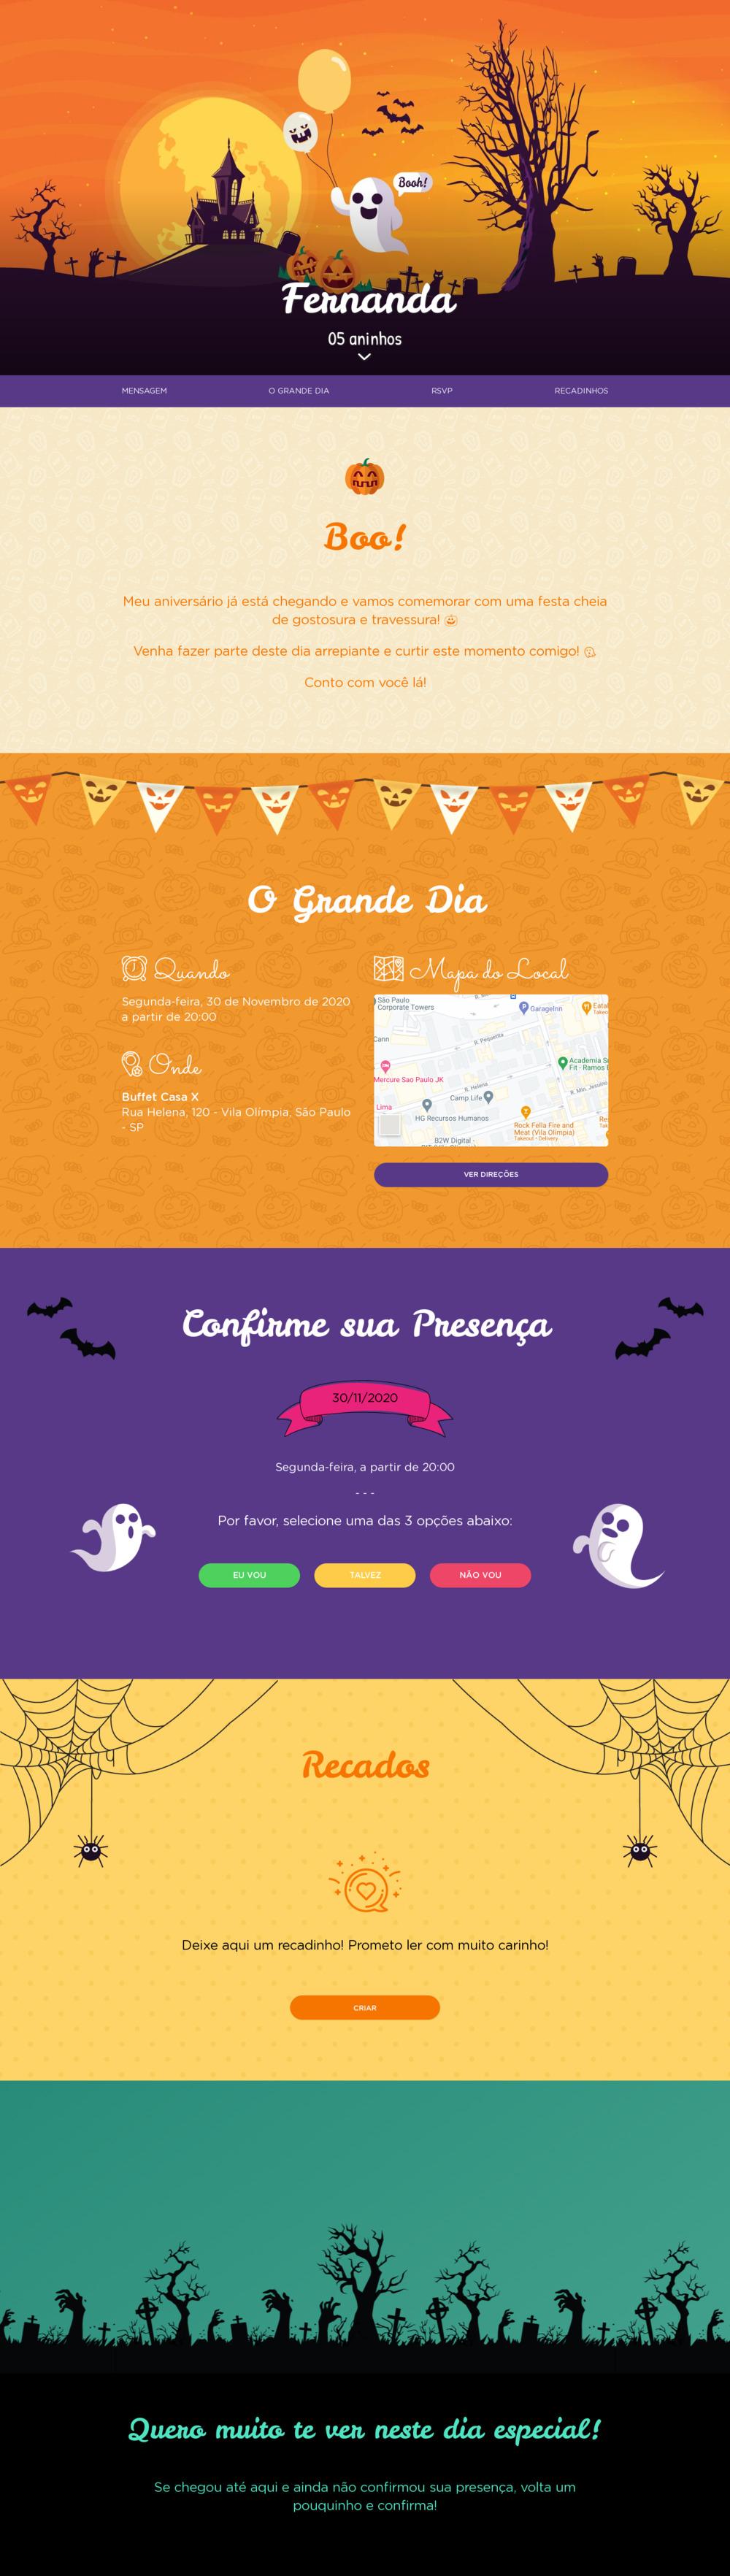 Vibe de Aniversario - Halloween